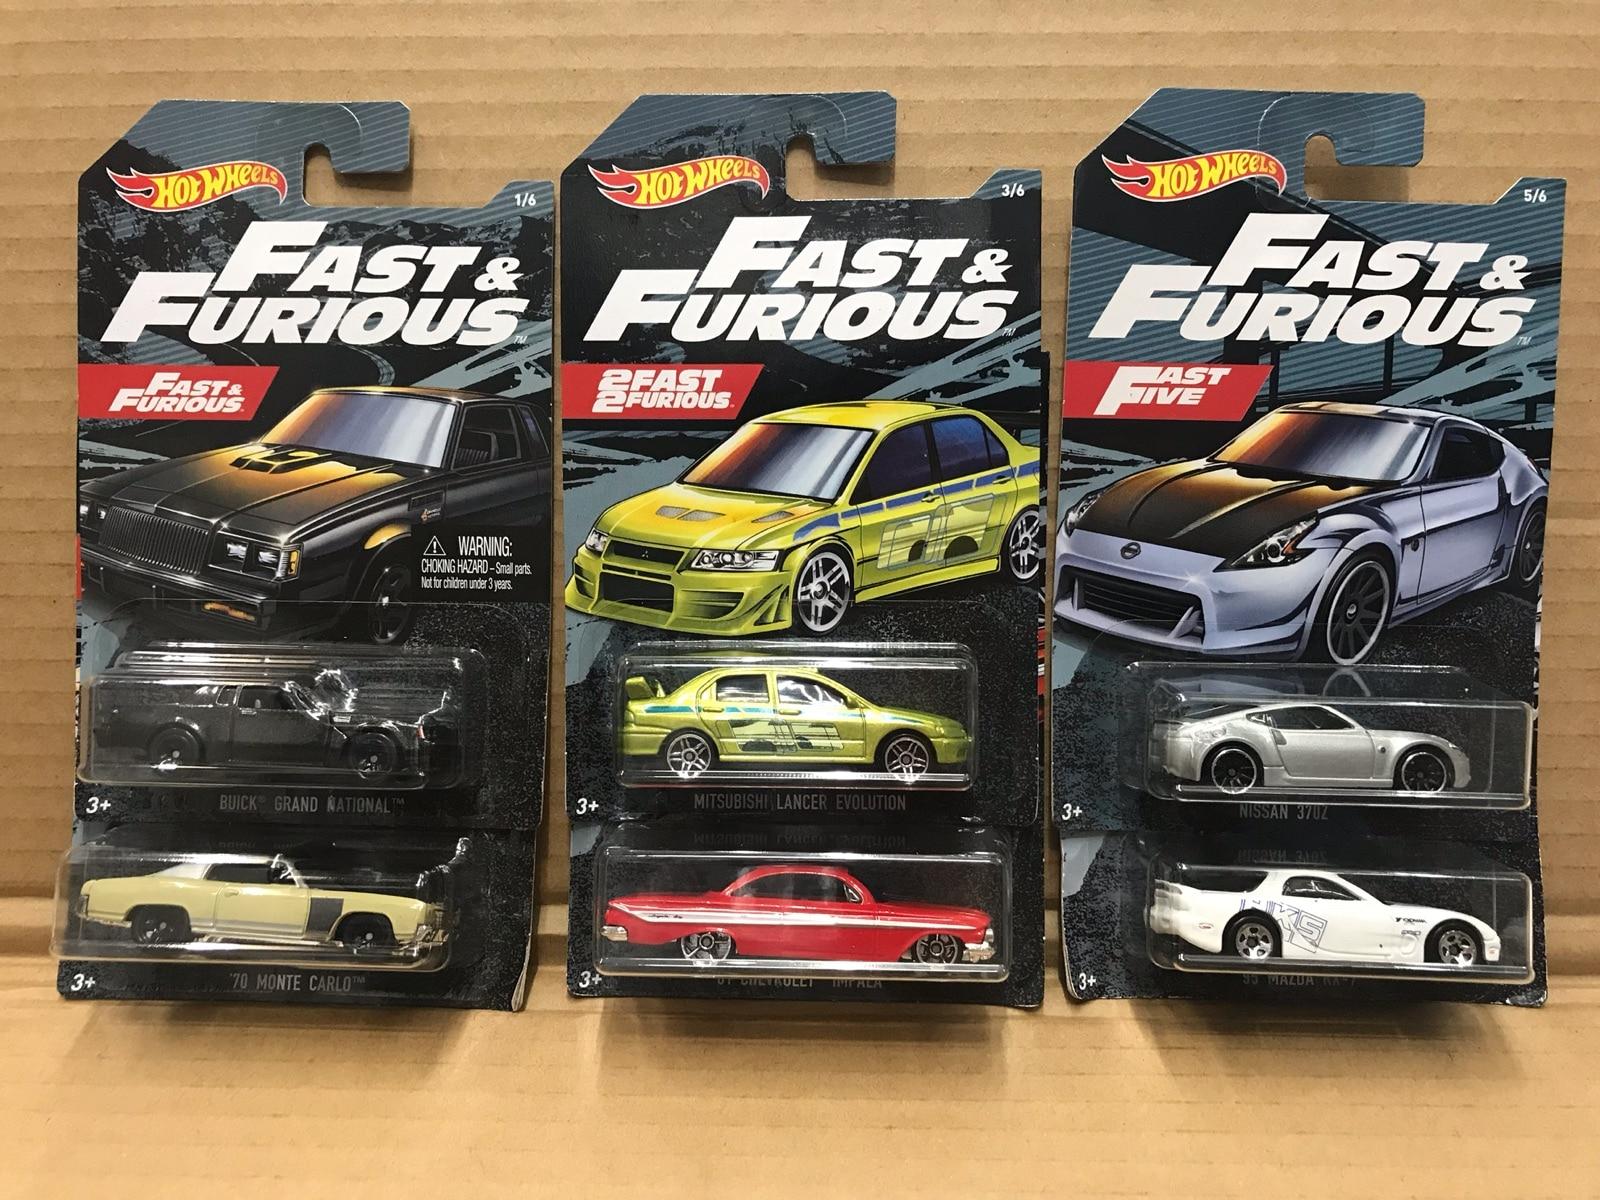 Hotwheels-سيارات Fast Furious الصغيرة ، 1/64 ، mitsubishi rx7 370z ، إصدار الجامعين ، لعبة أطفال معدنية ، هدية الكريسماس